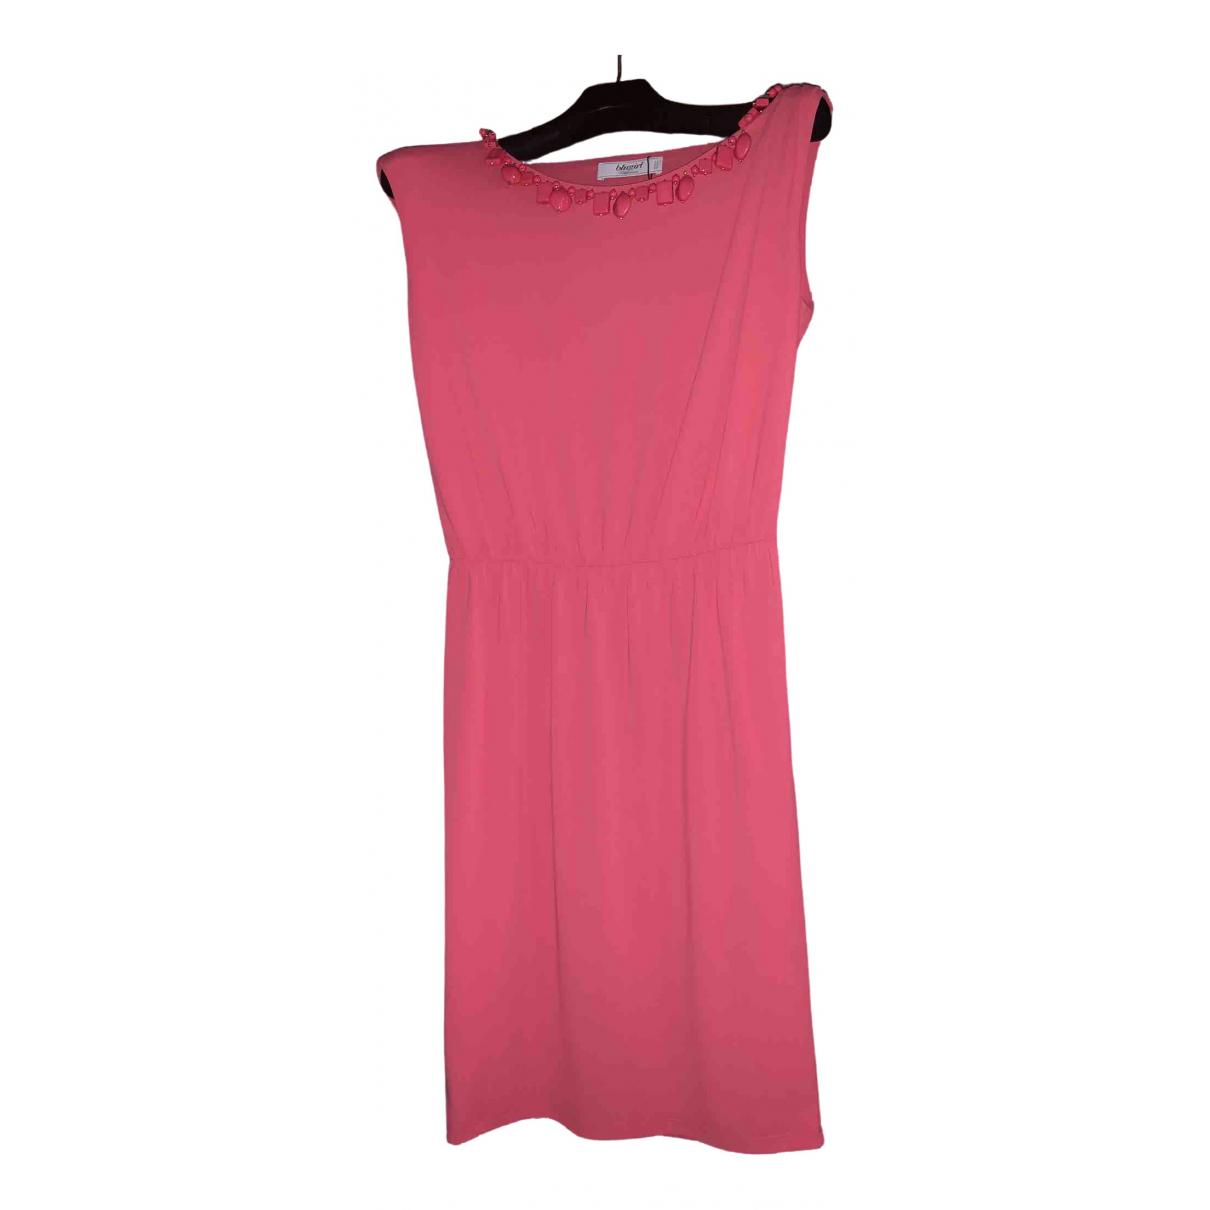 Blumarine \N Pink dress for Women M International